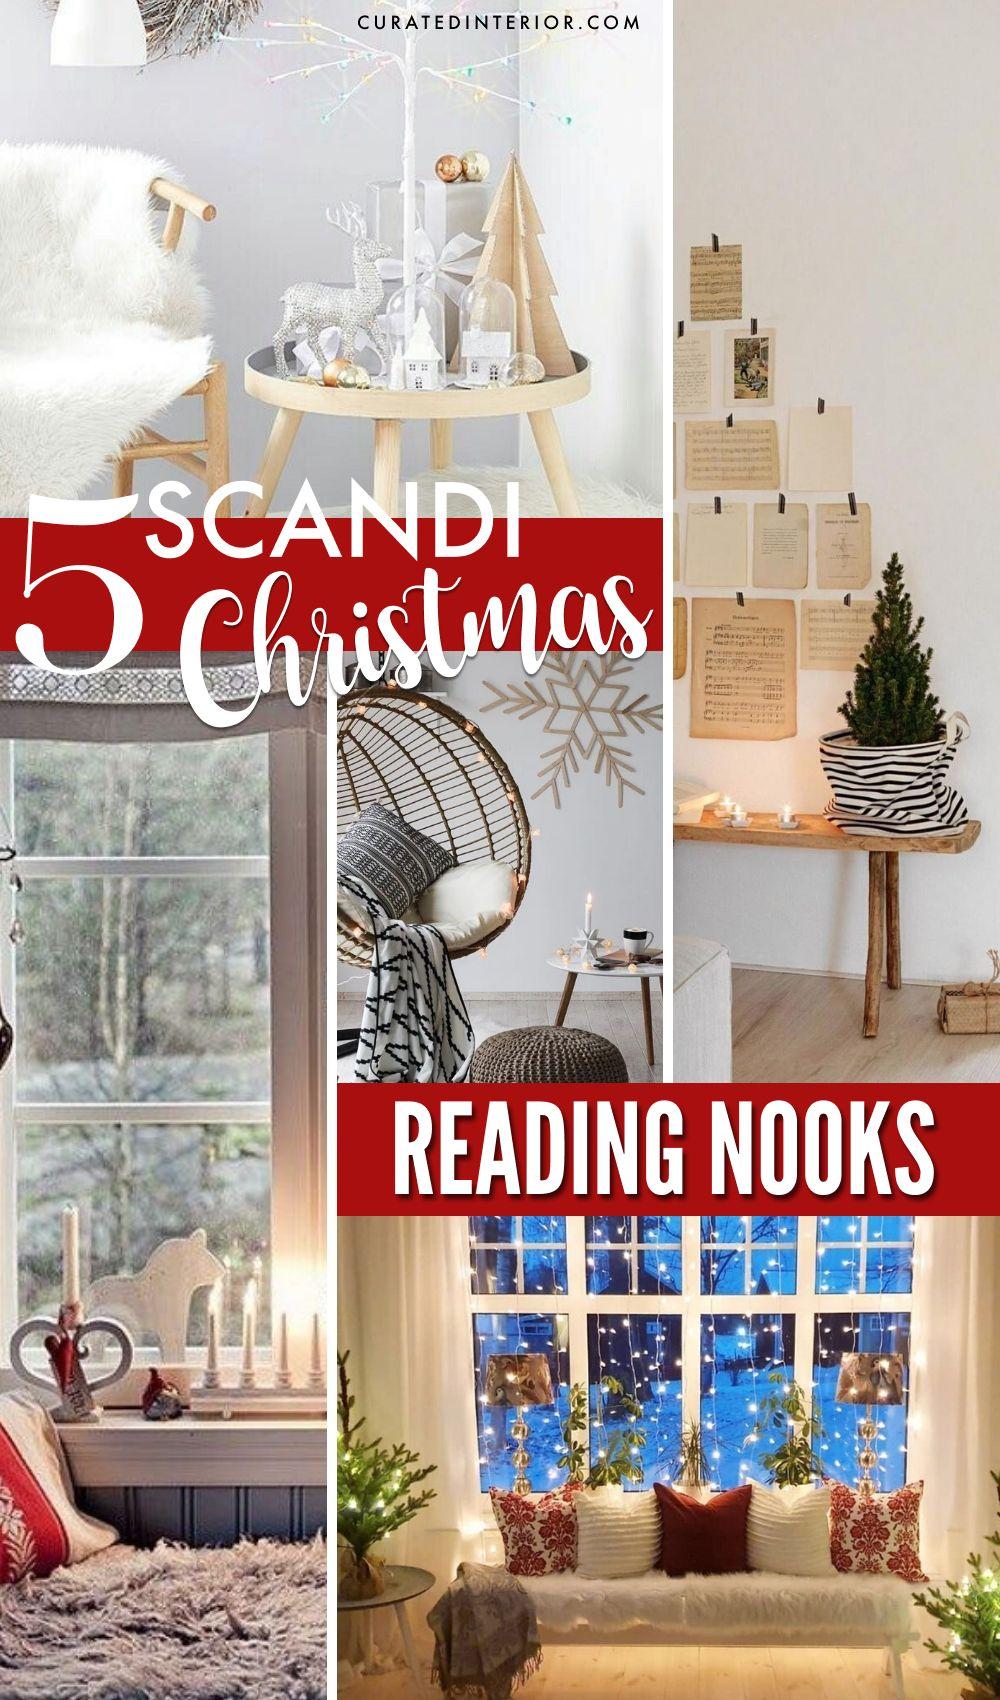 5 Scandi Christmas Reading Nooks